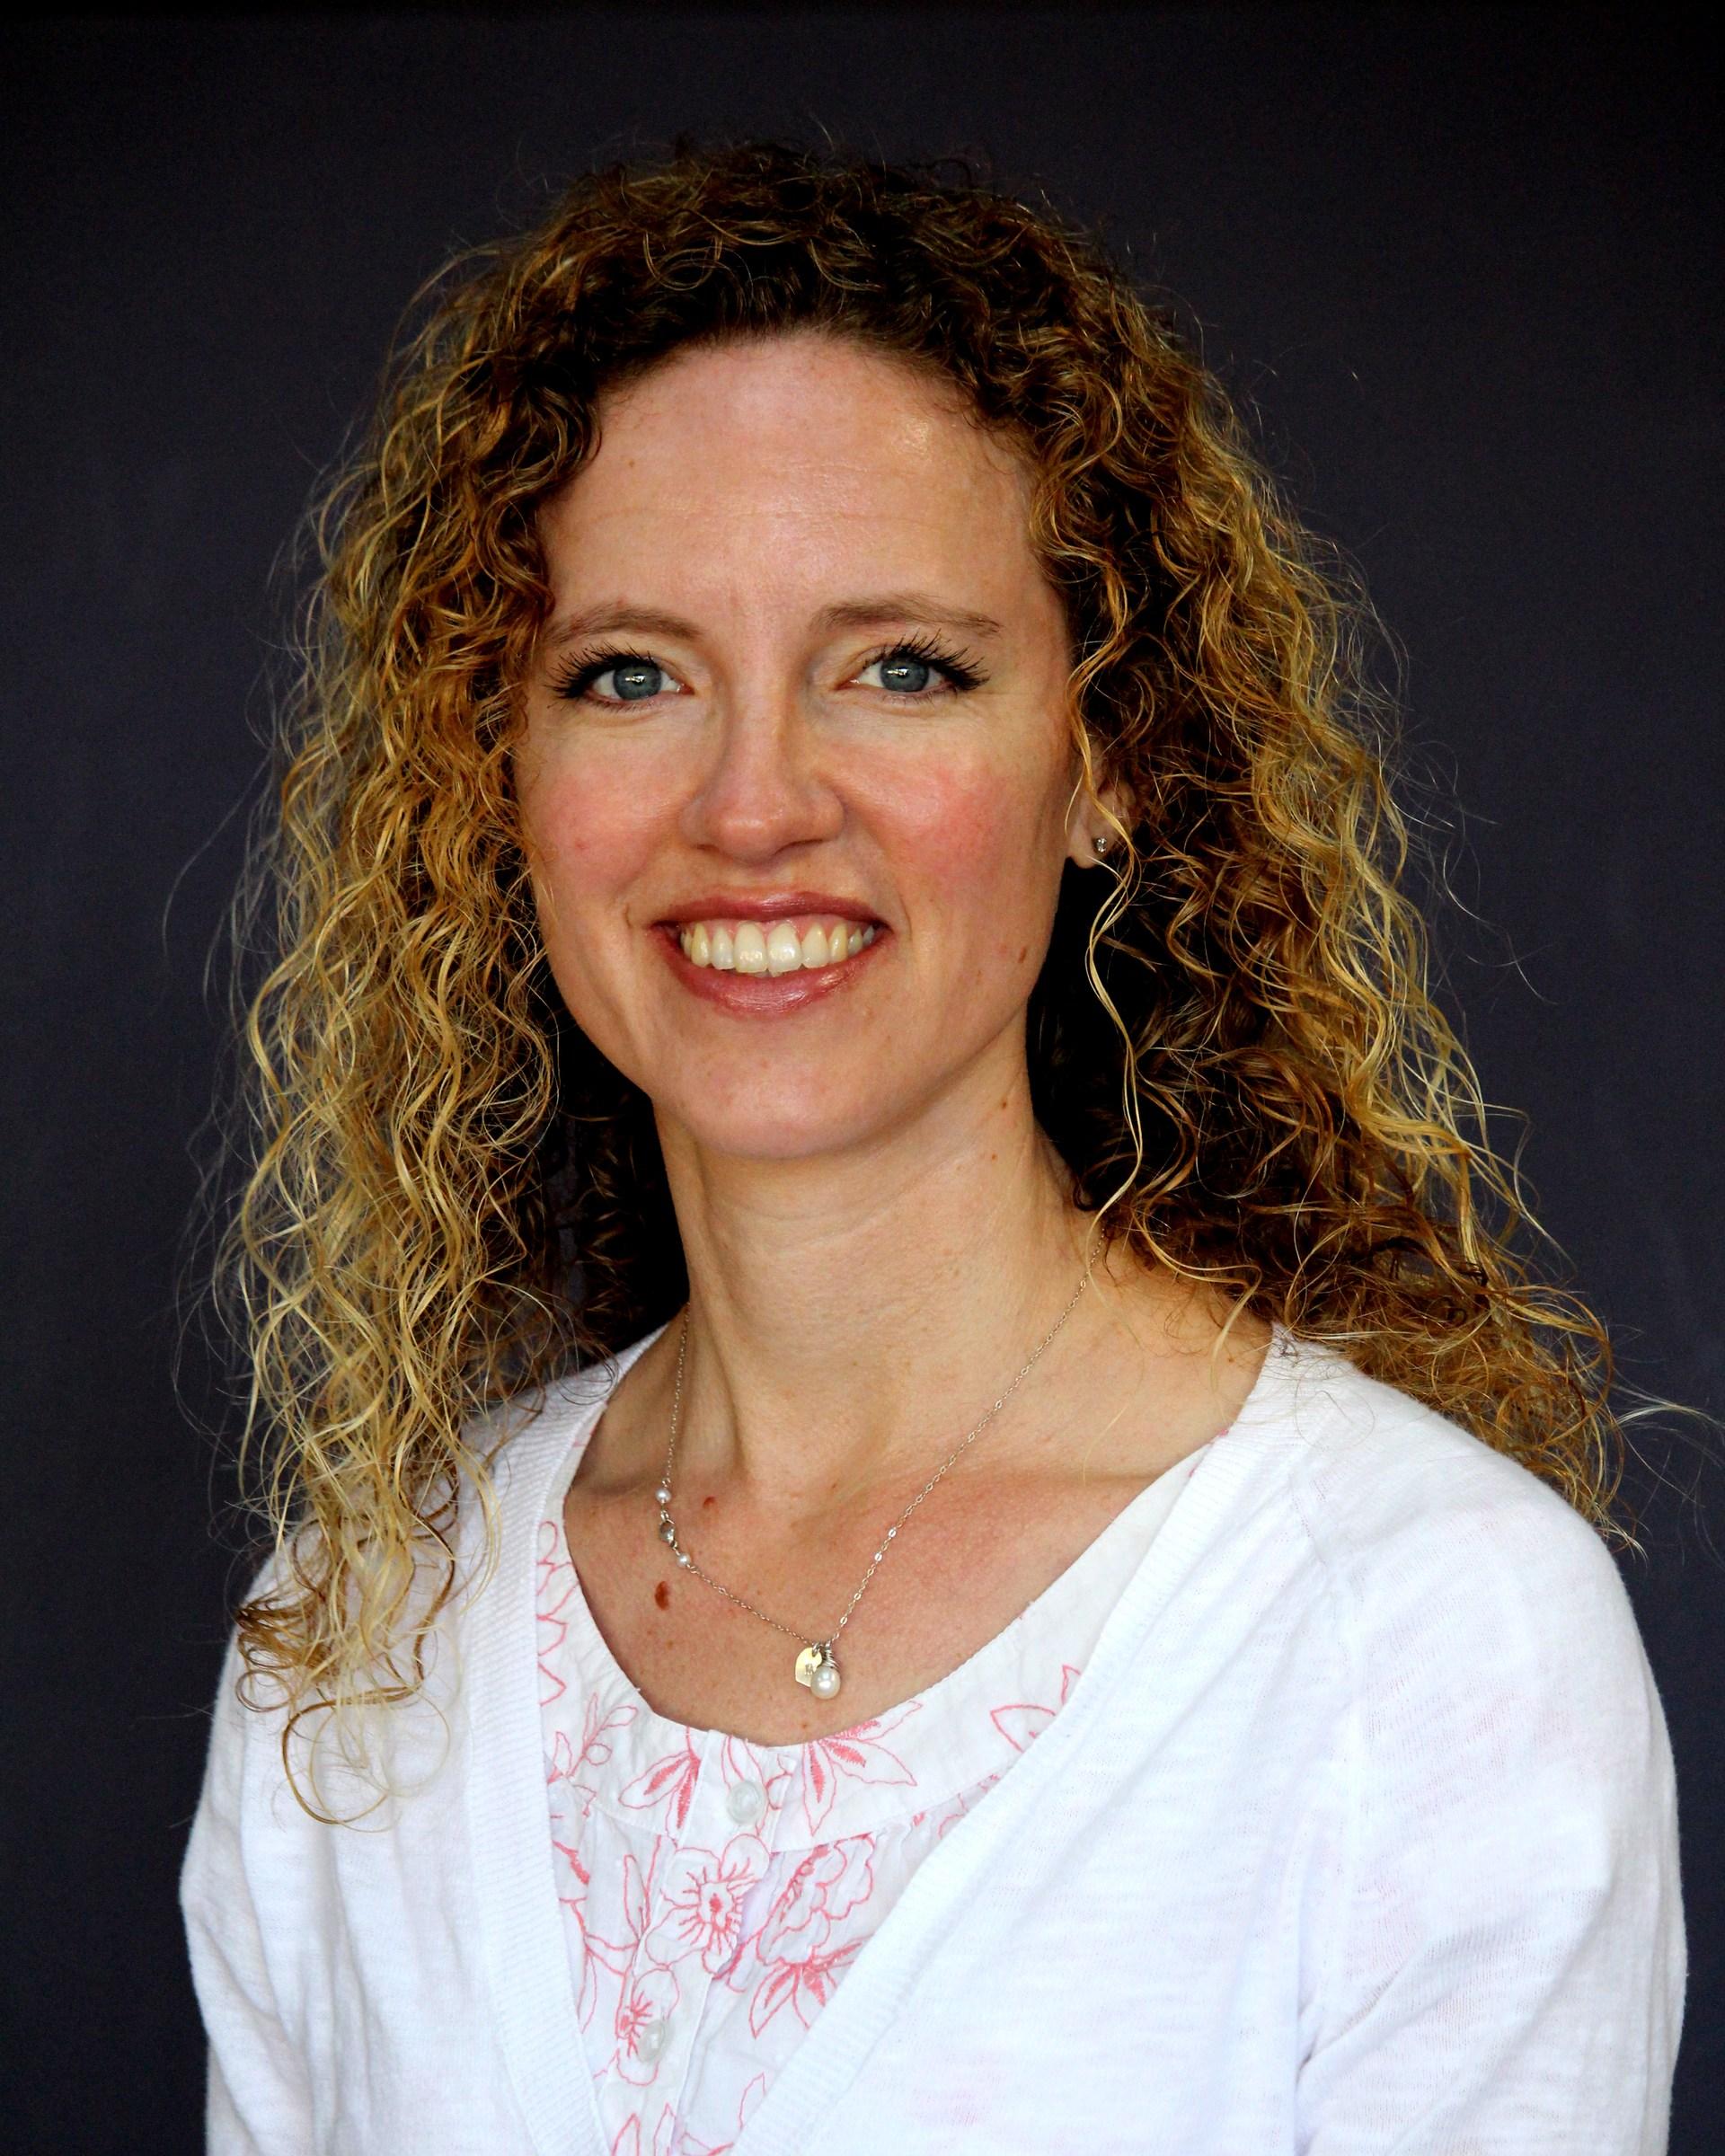 Megan Bouslaugh